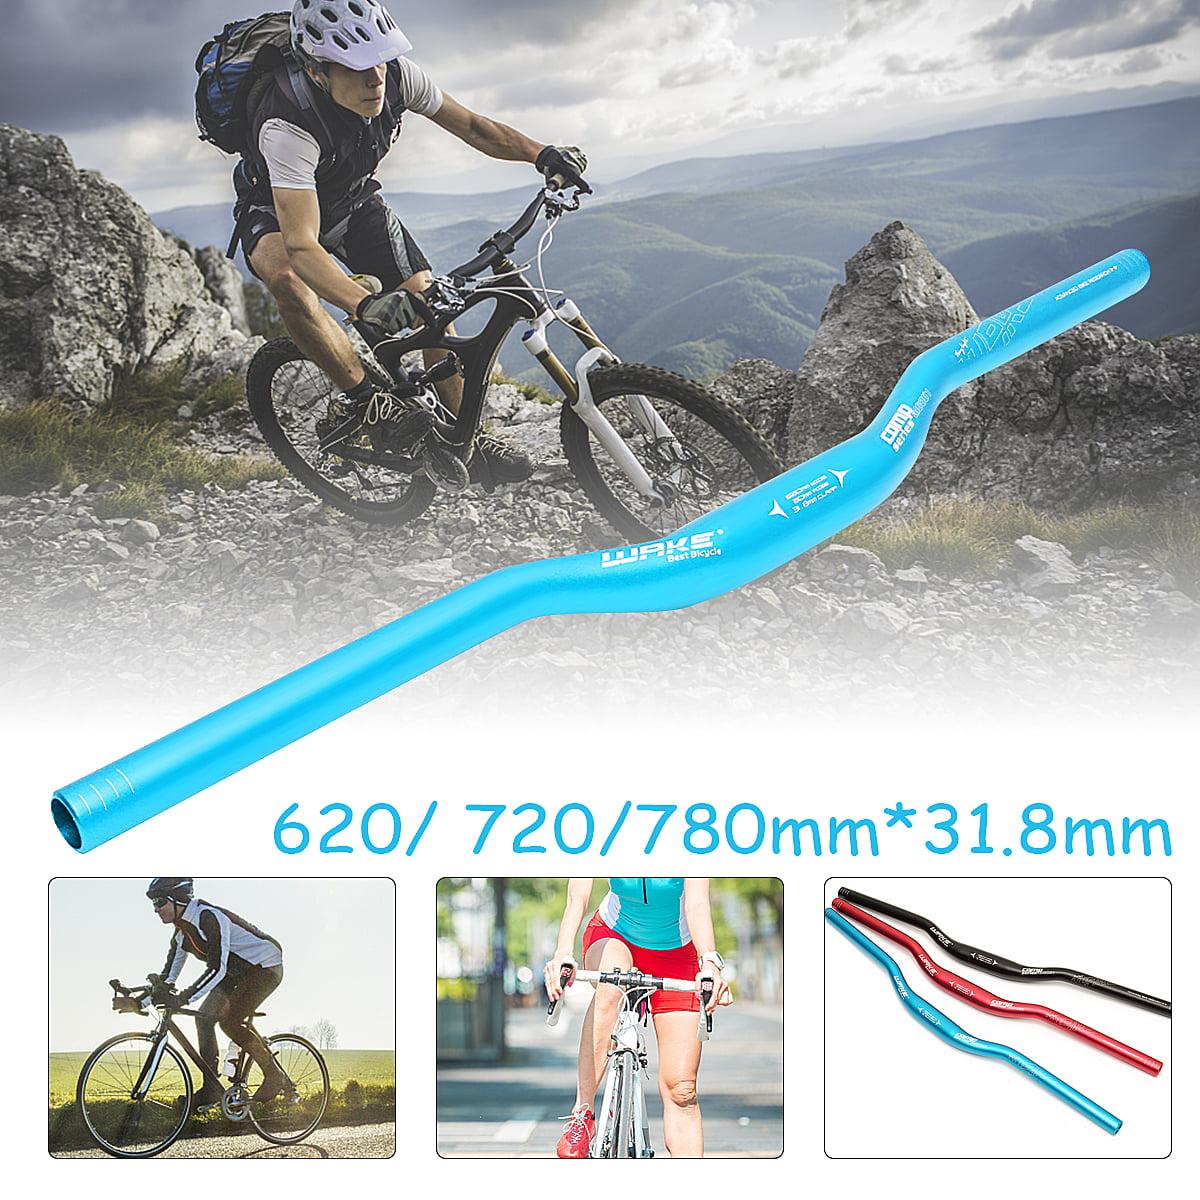 Grtsunsea 620mm/24.4'' Cycling Aluminium Alloy Mountain Bike Bicycle Handlebar Riser Bar 3 Colors